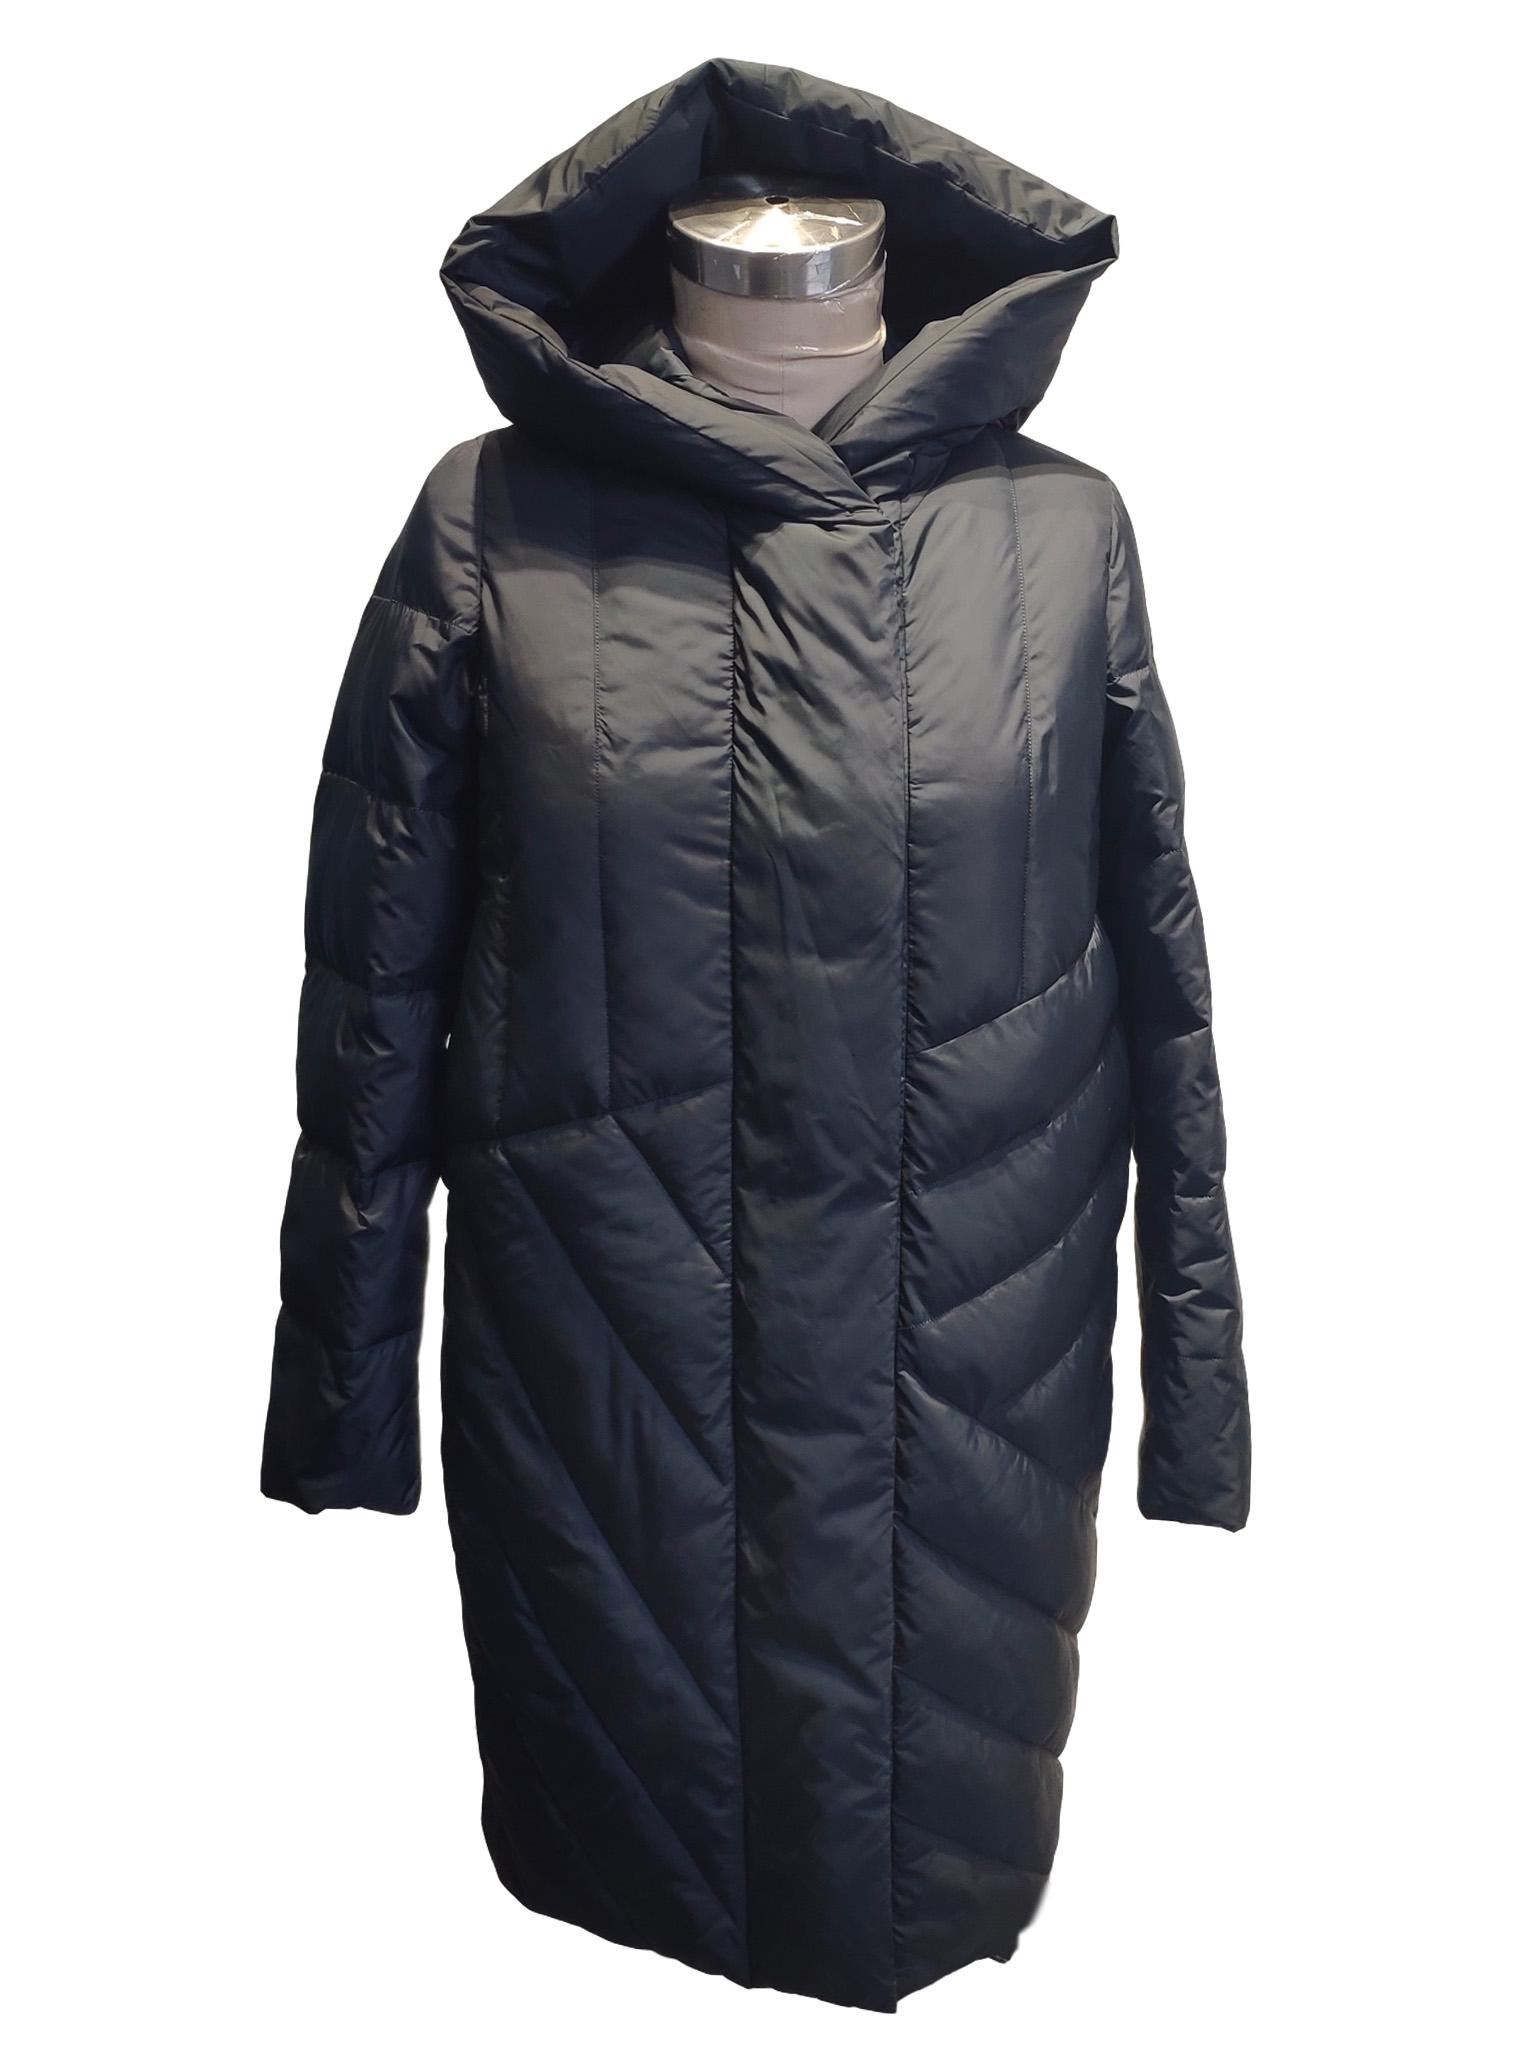 marmot down jacket FACTORY